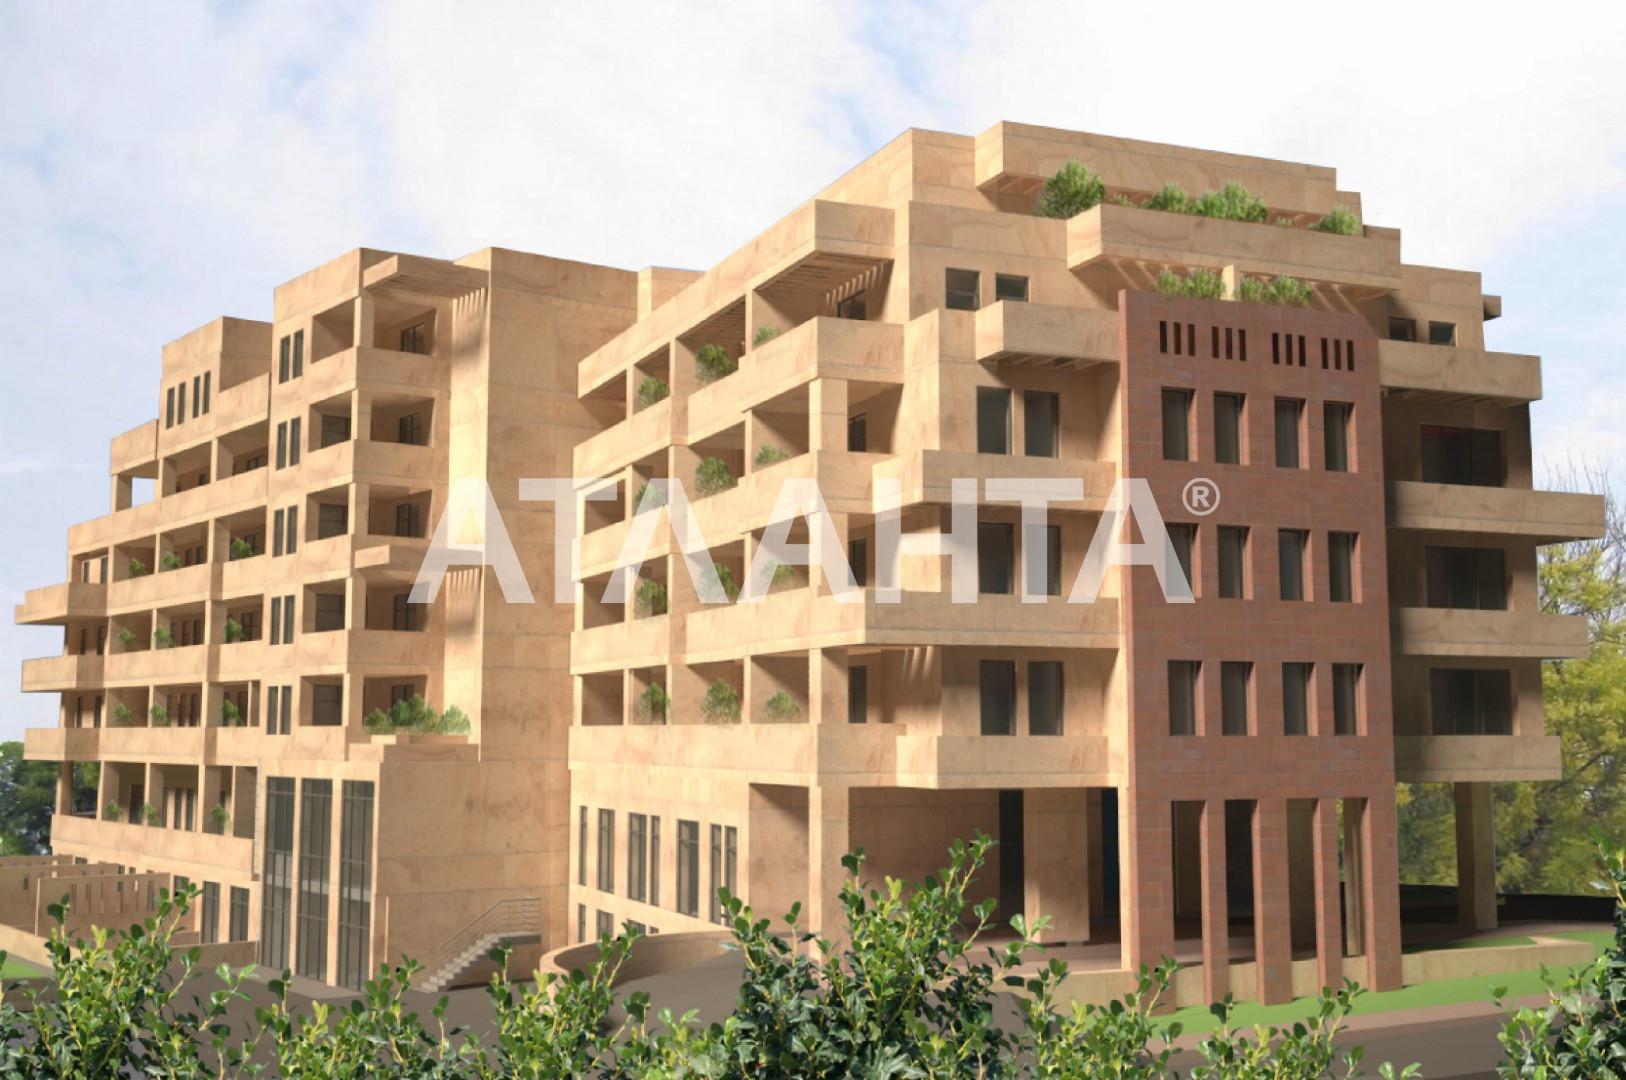 Продается 2-комнатная Квартира на ул. Каманина — 99 590 у.е.